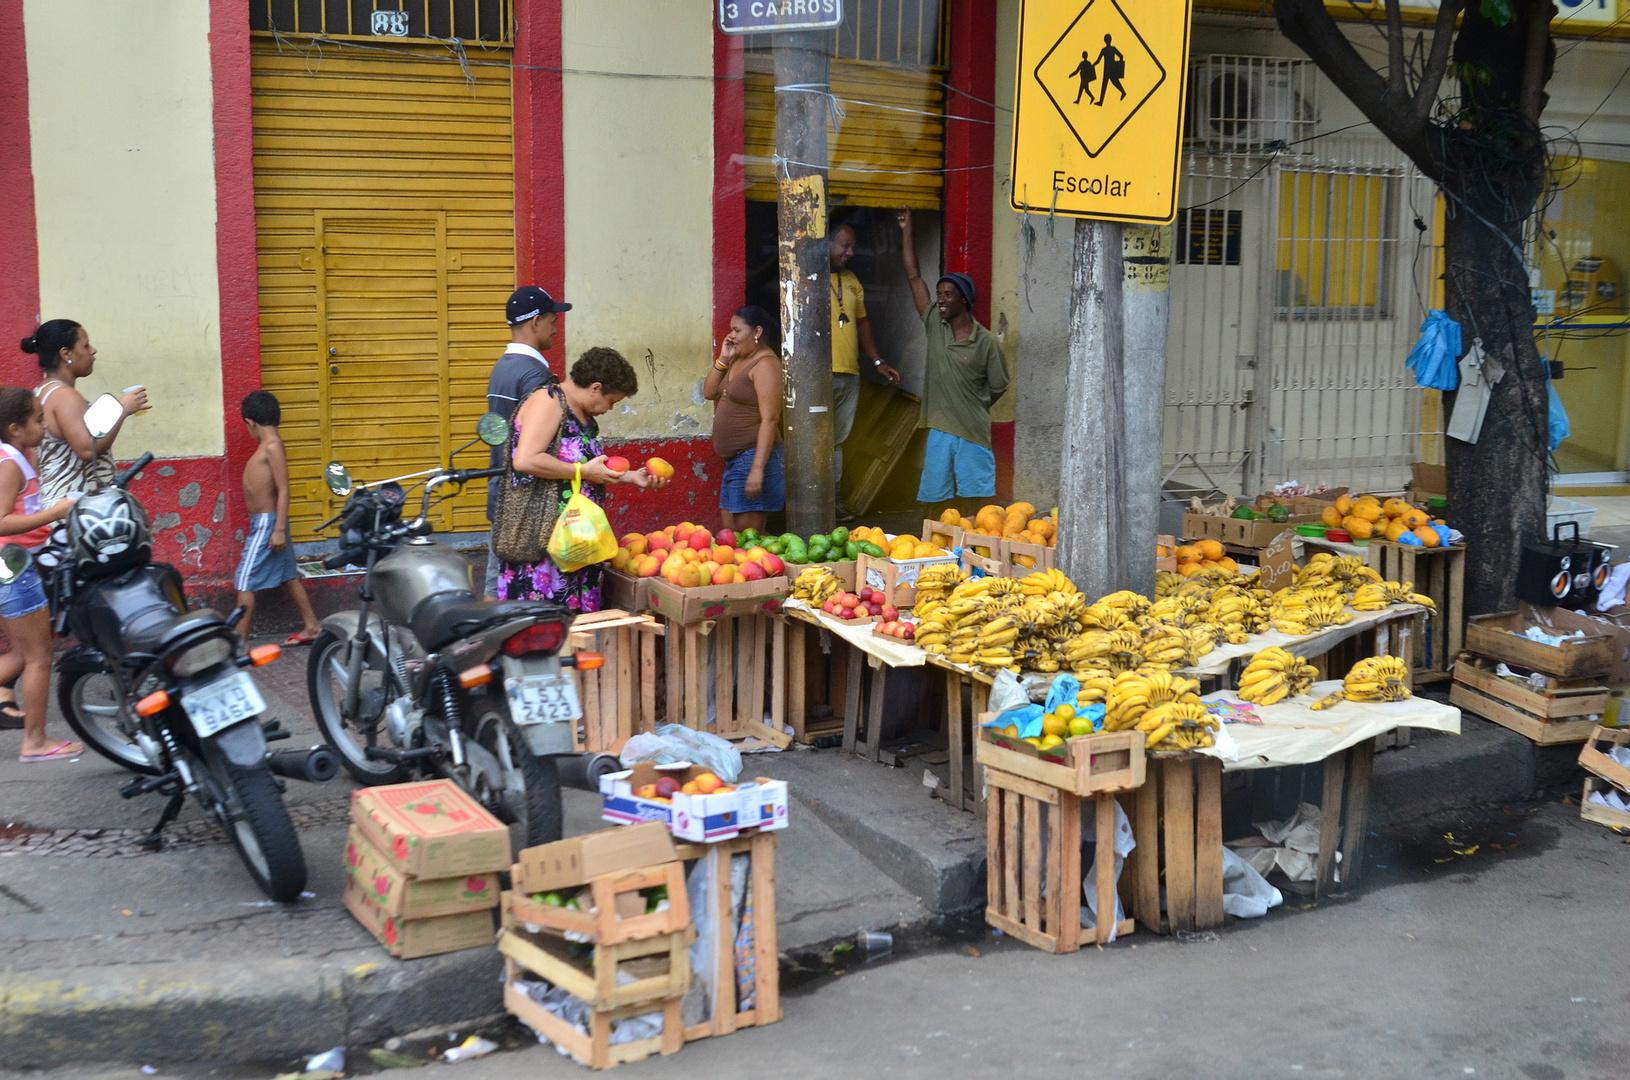 Catumbi / Rio de Janeiro